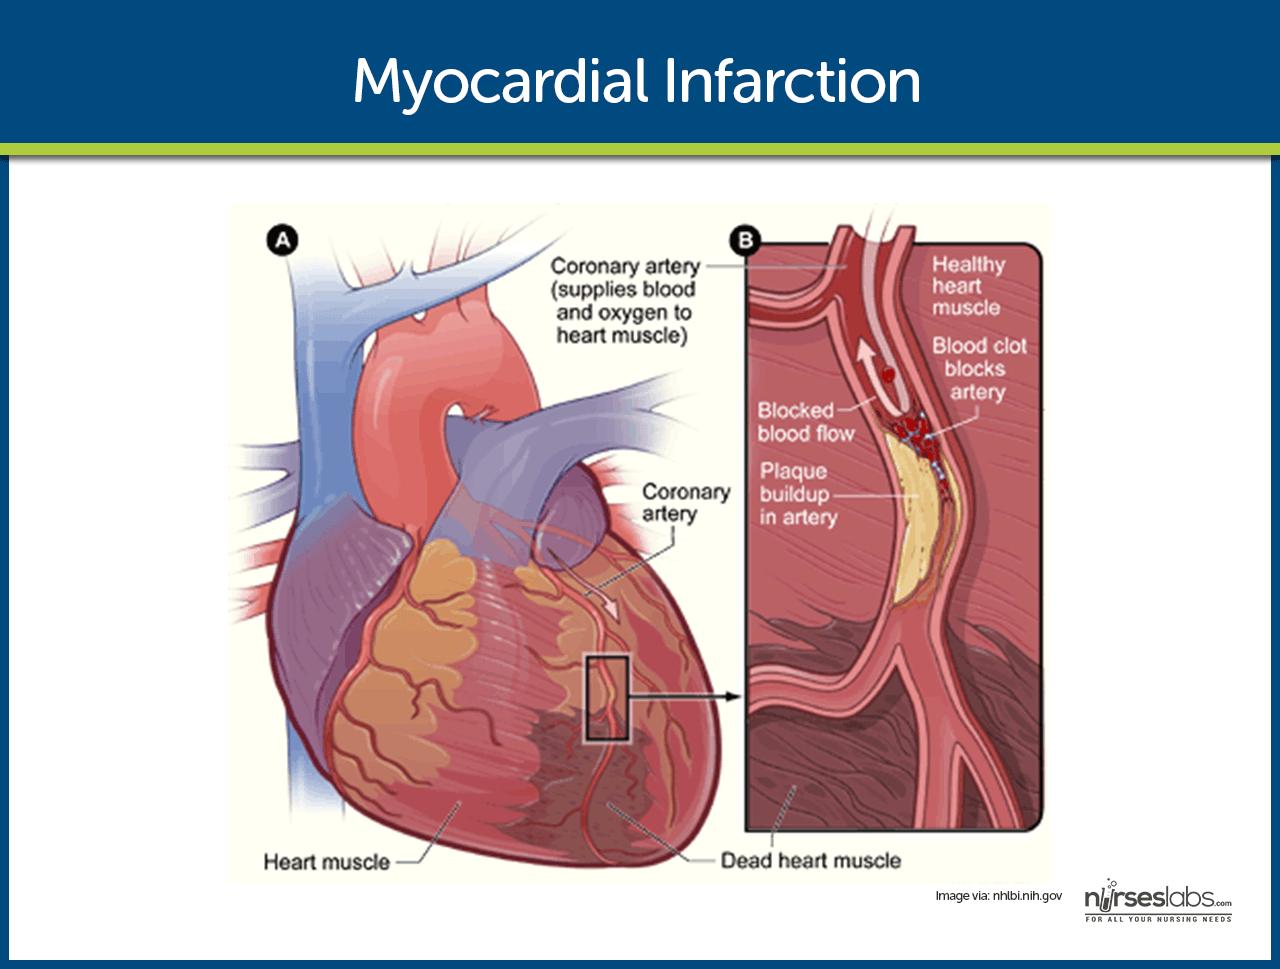 Myocardial Infarction Pathophysiology